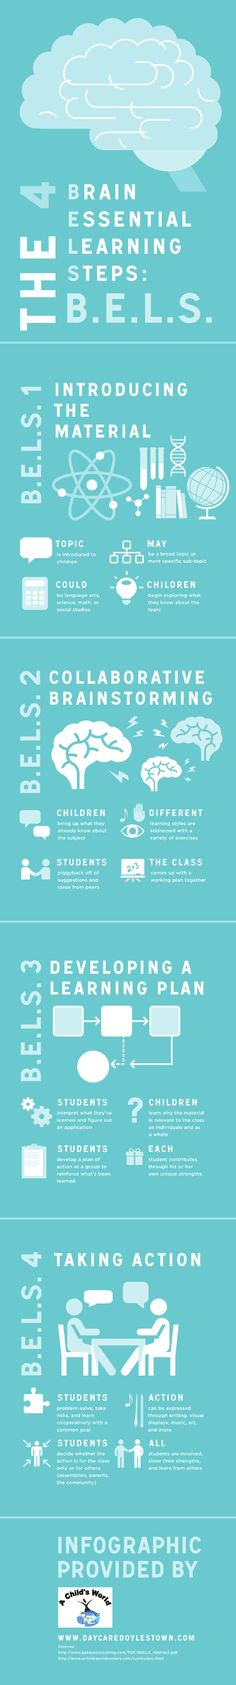 The 4 Brain Essential Learning Steps - Edudemic